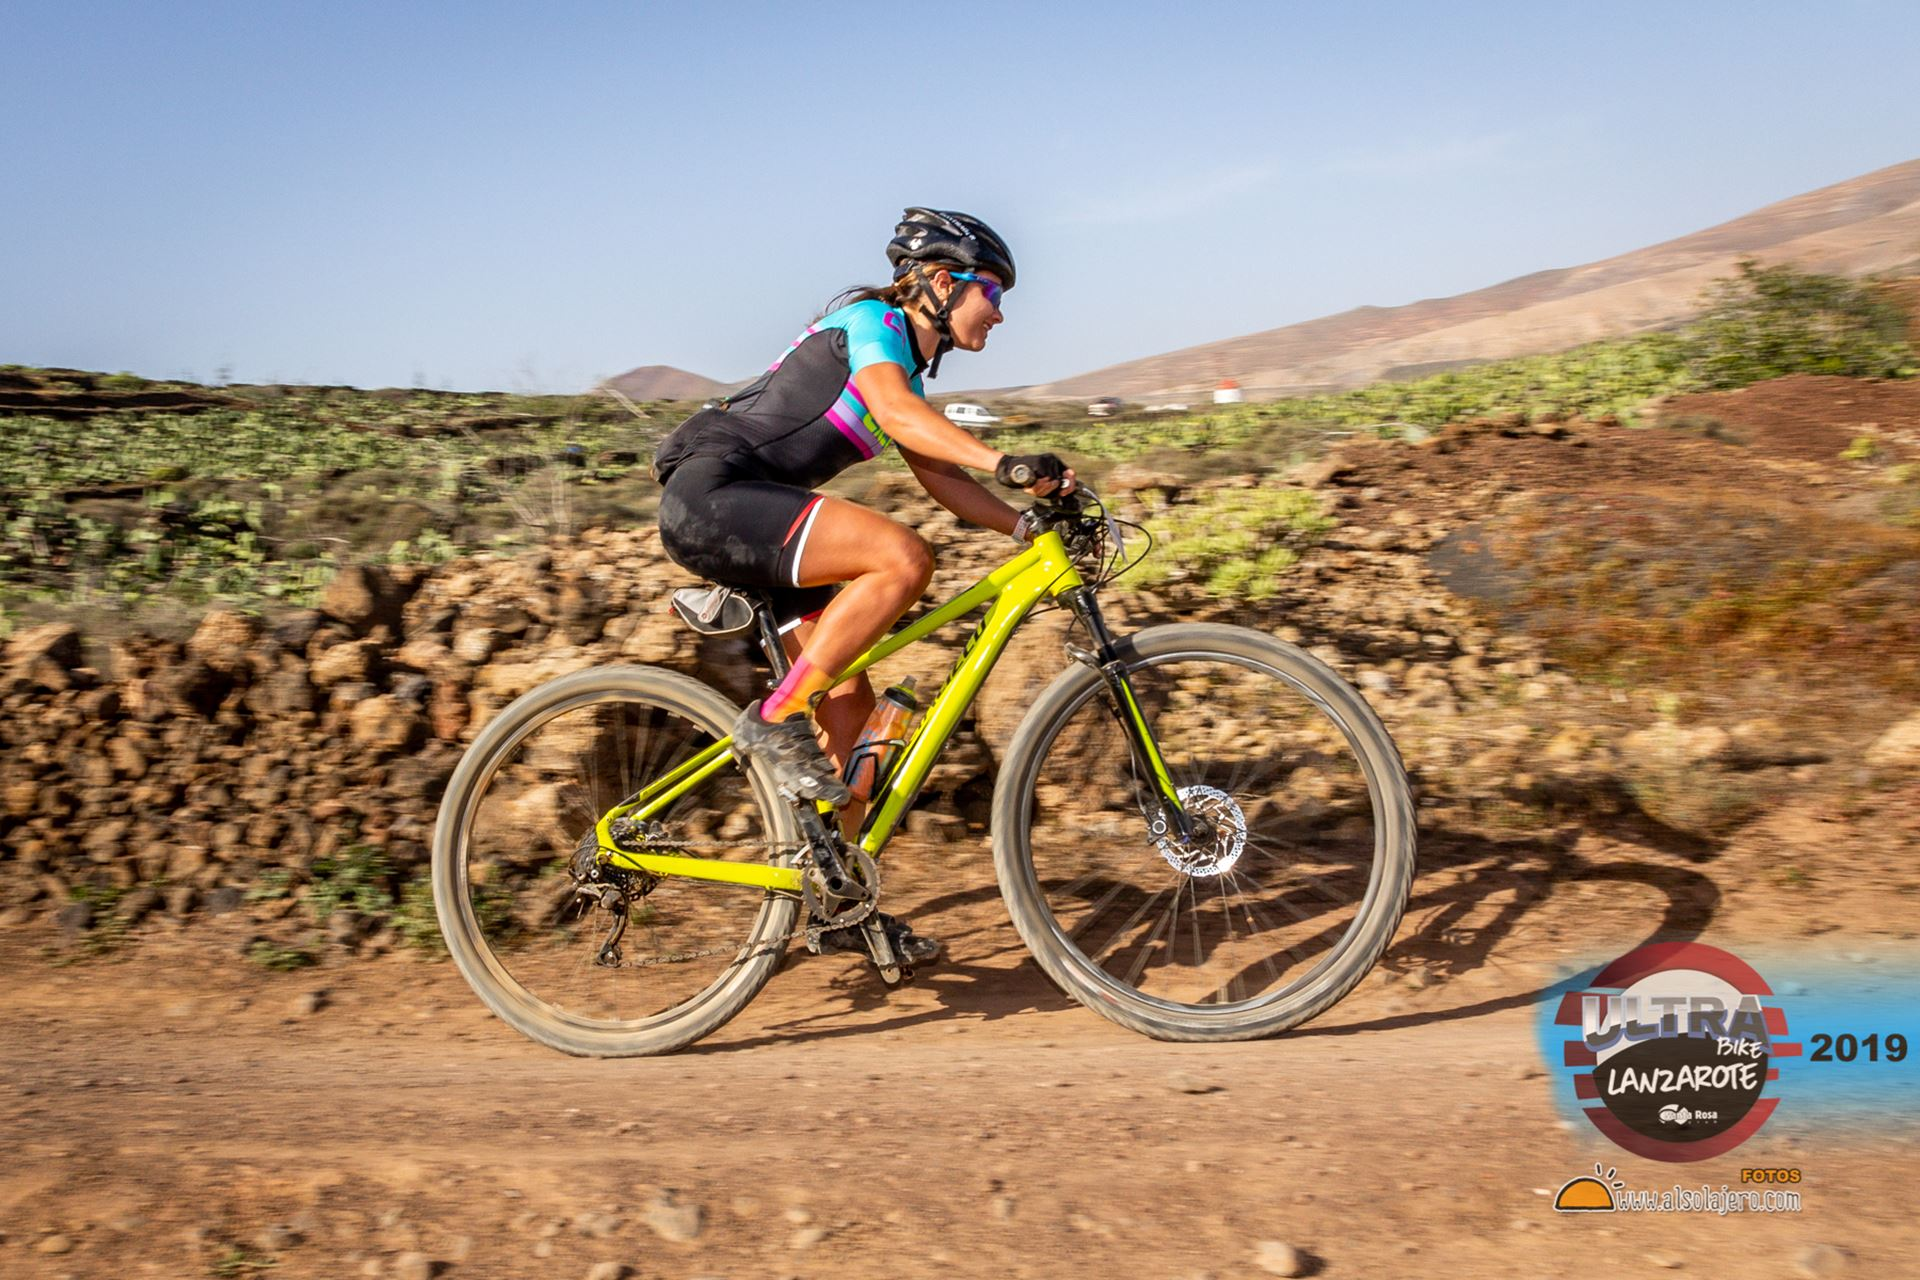 Sector Guatiza 2ª Etapa Ultrabike 2019 Fotos Alsolajero.com-189